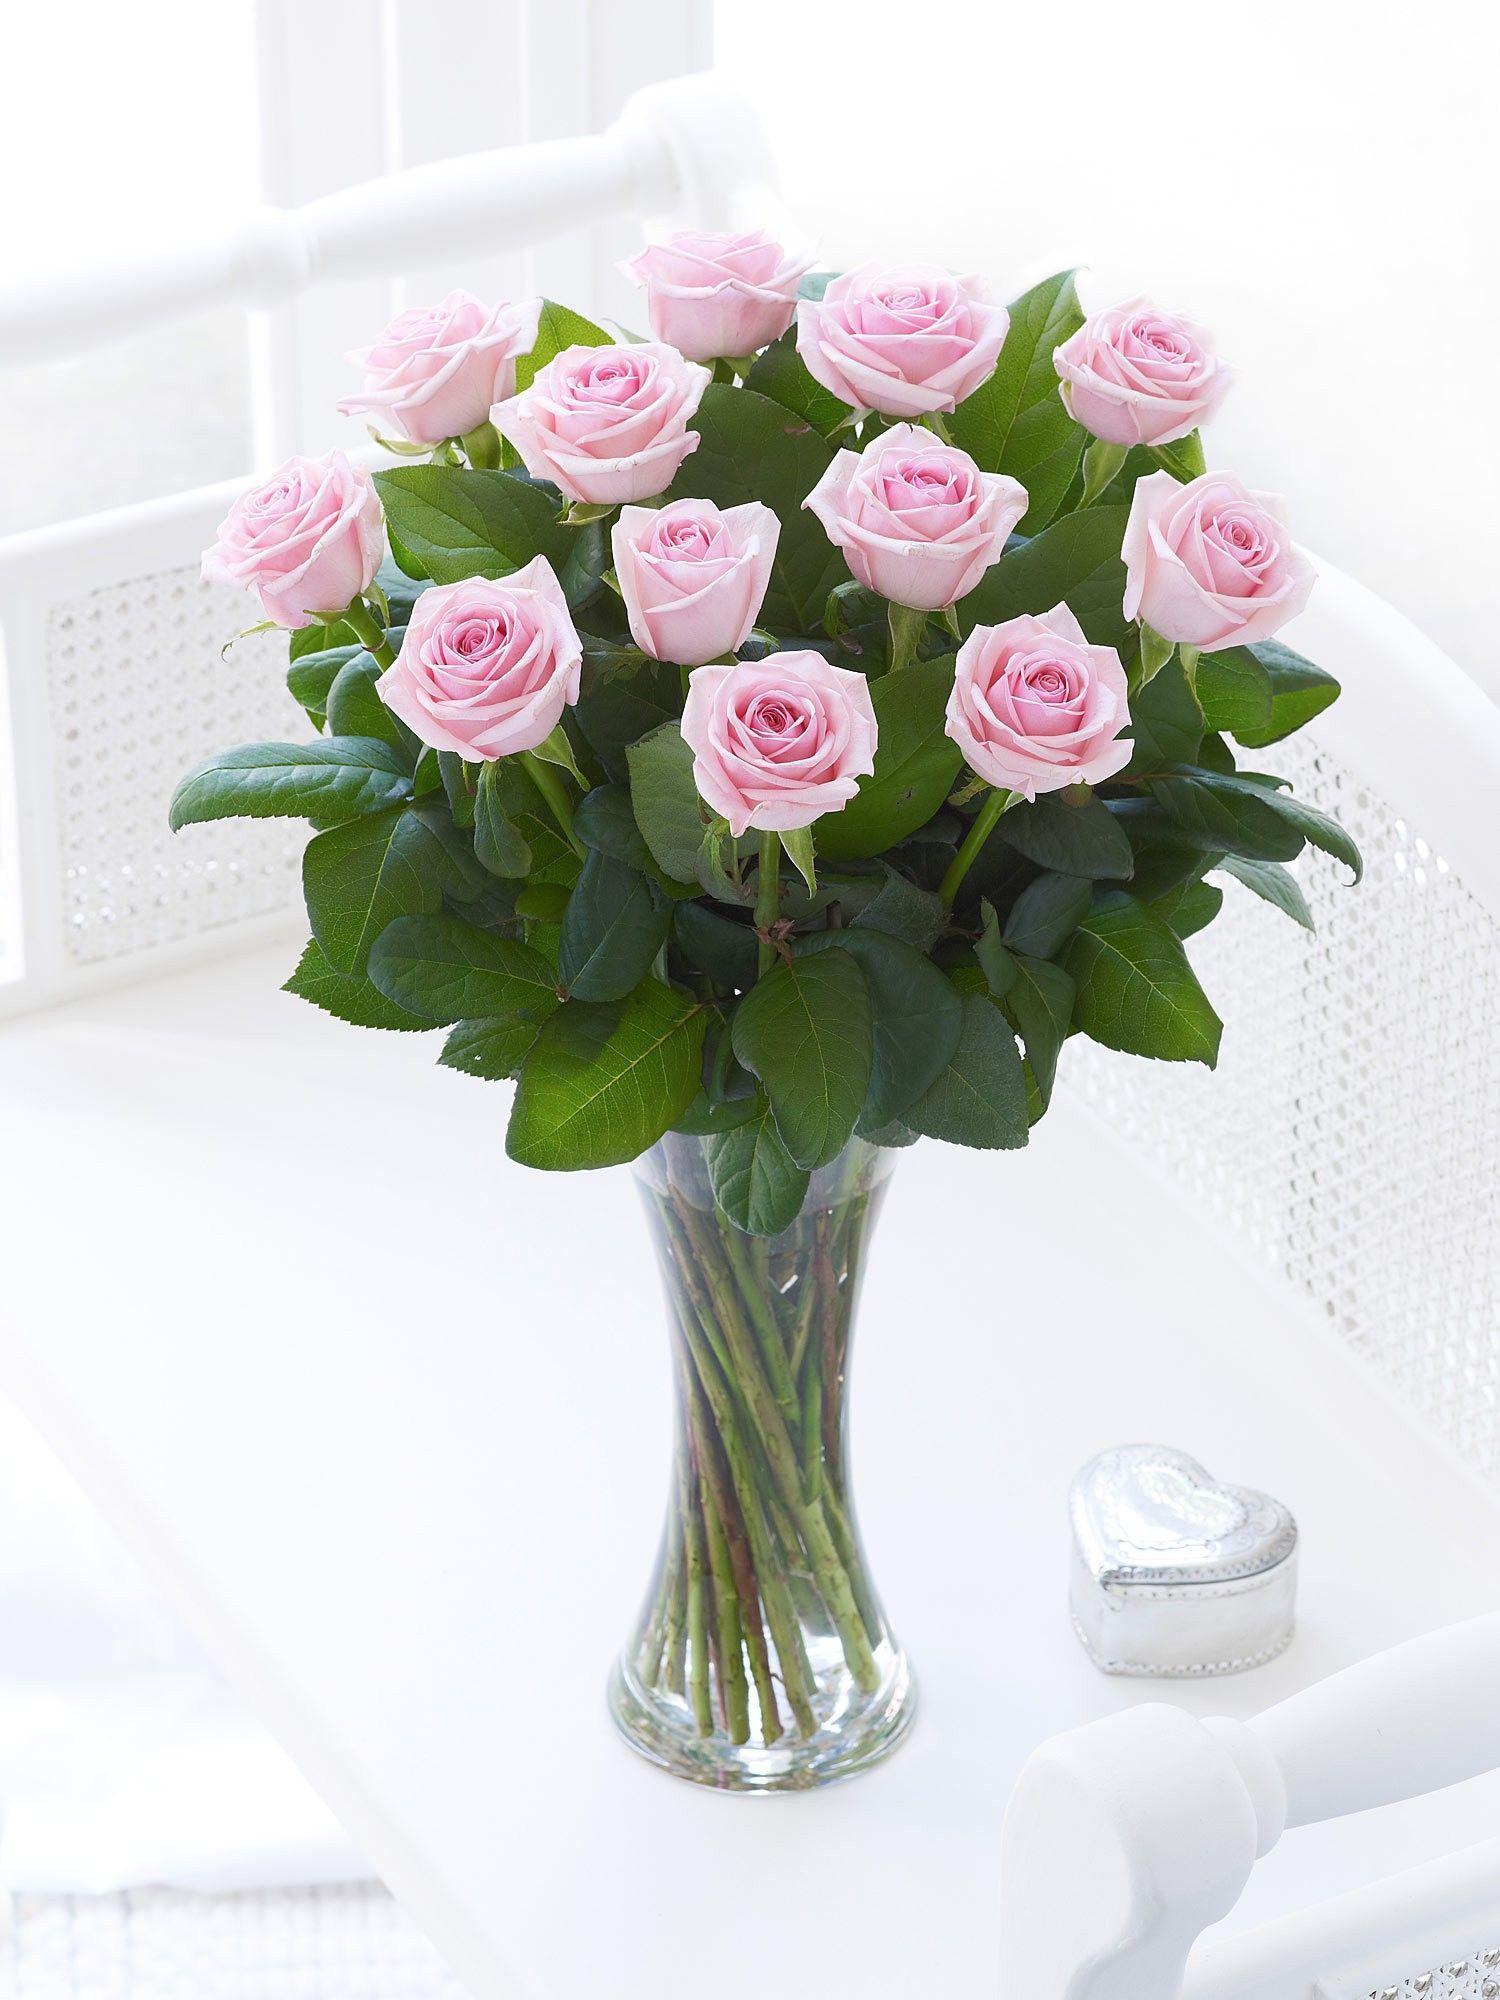 Flowers happy birthday cutare google kingdom of flowers flowers happy birthday cutare google izmirmasajfo